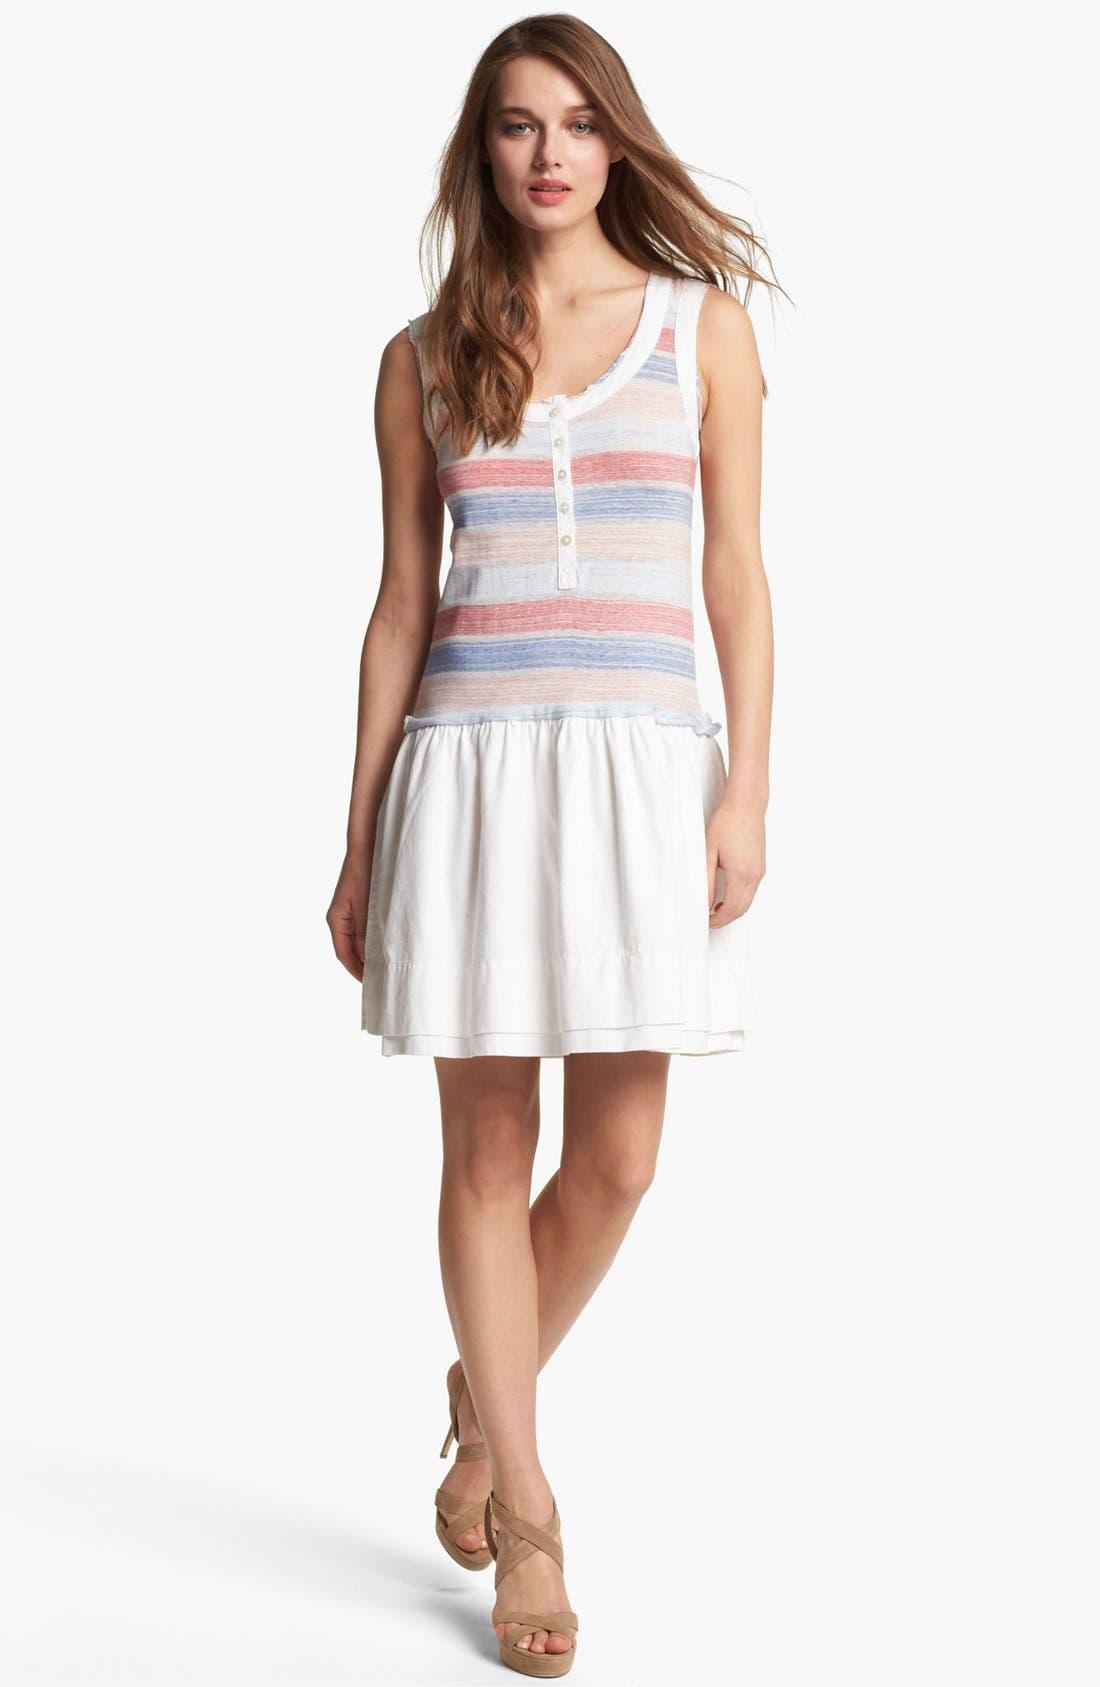 Main Image - MARC BY MARC JACOBS 'Sketch' Stripe Cotton Blend Tank Dress